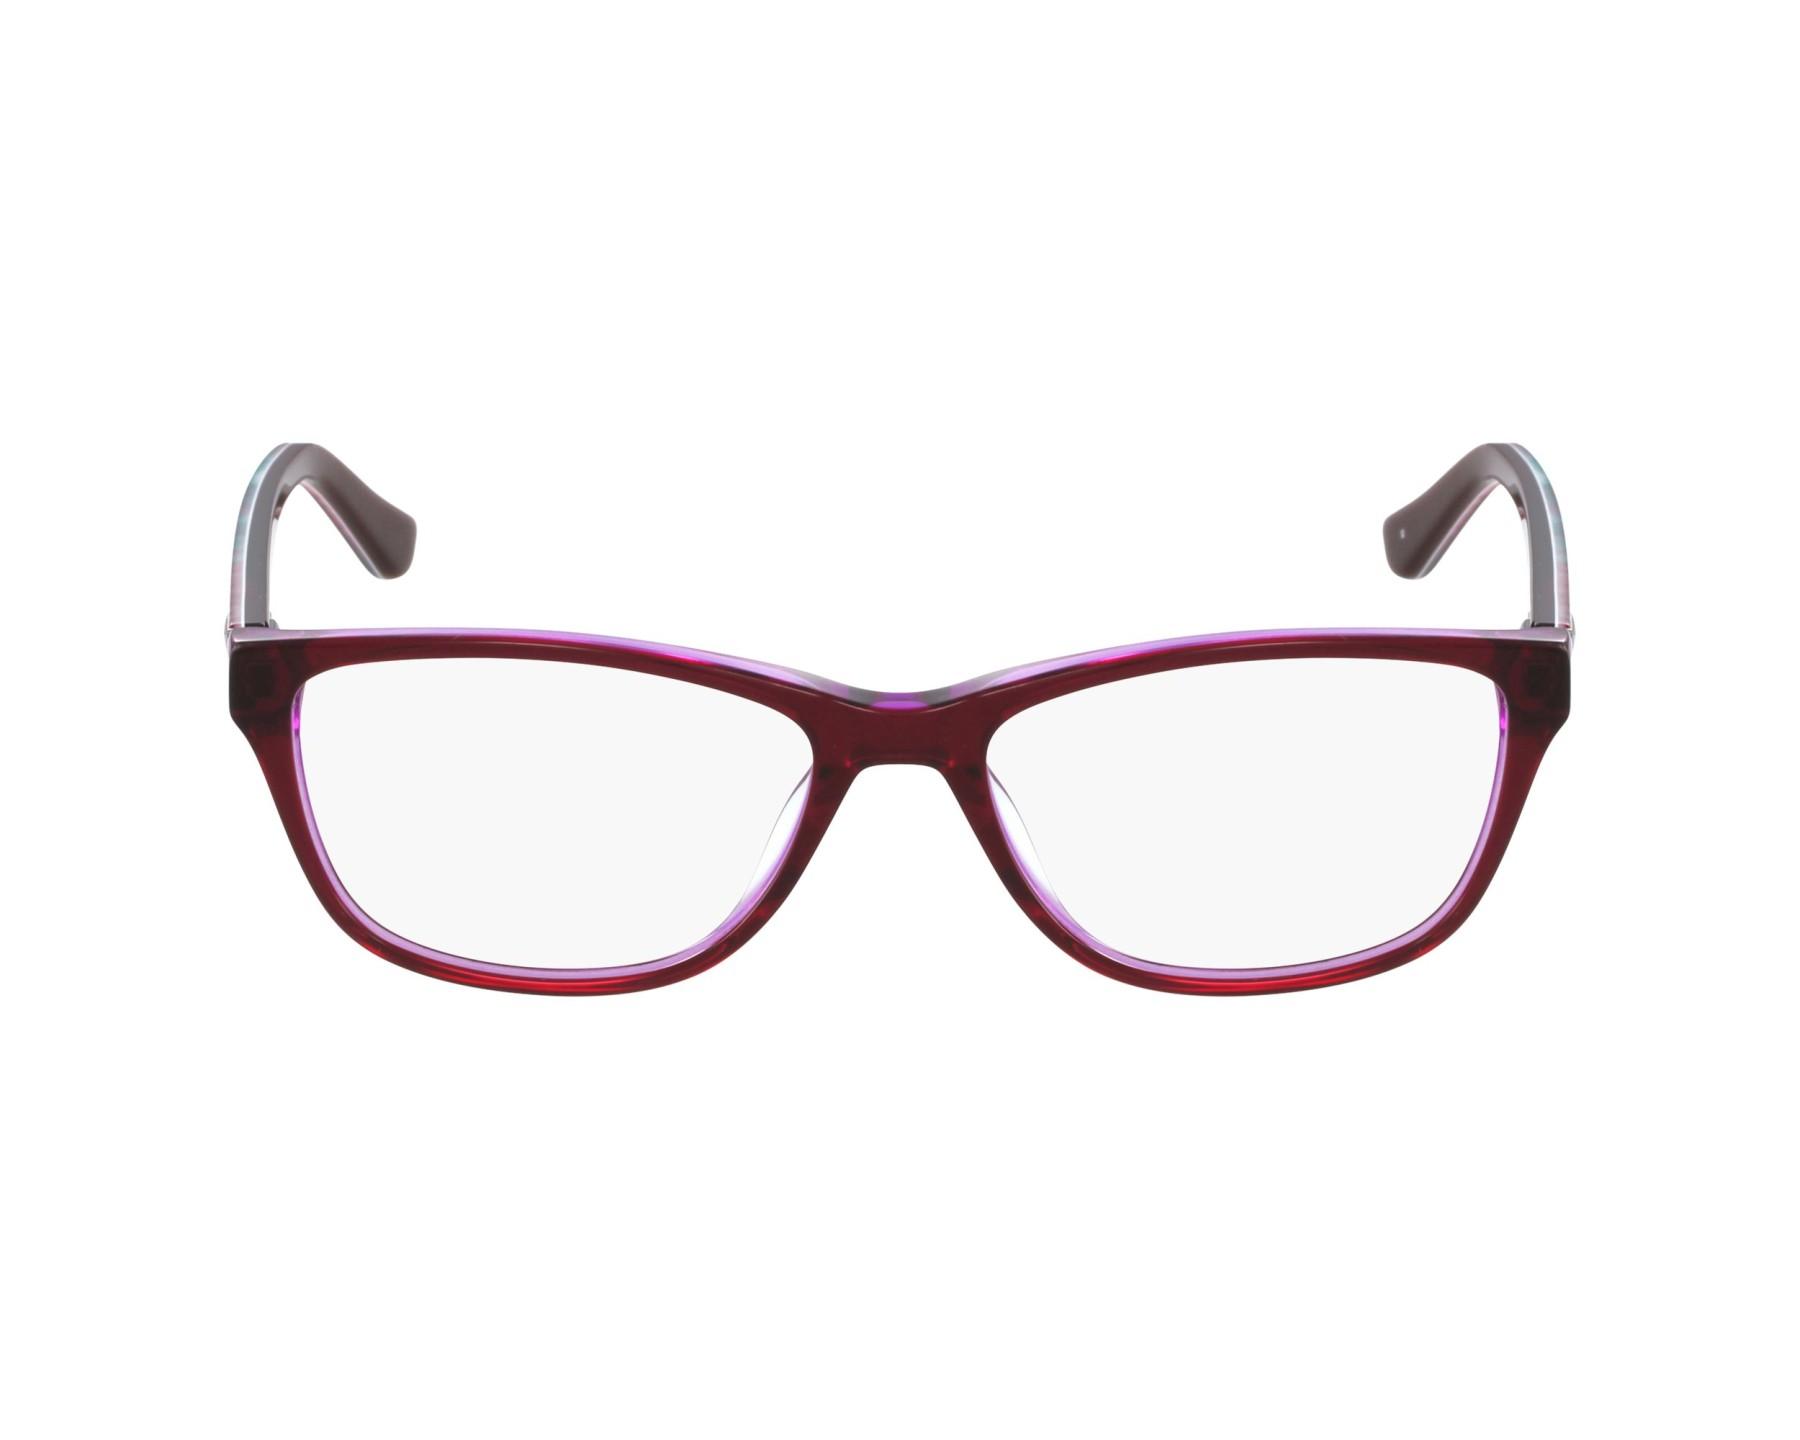 Guess Eyeglasses GU-2513 066 Bordeaux | visio-net.com